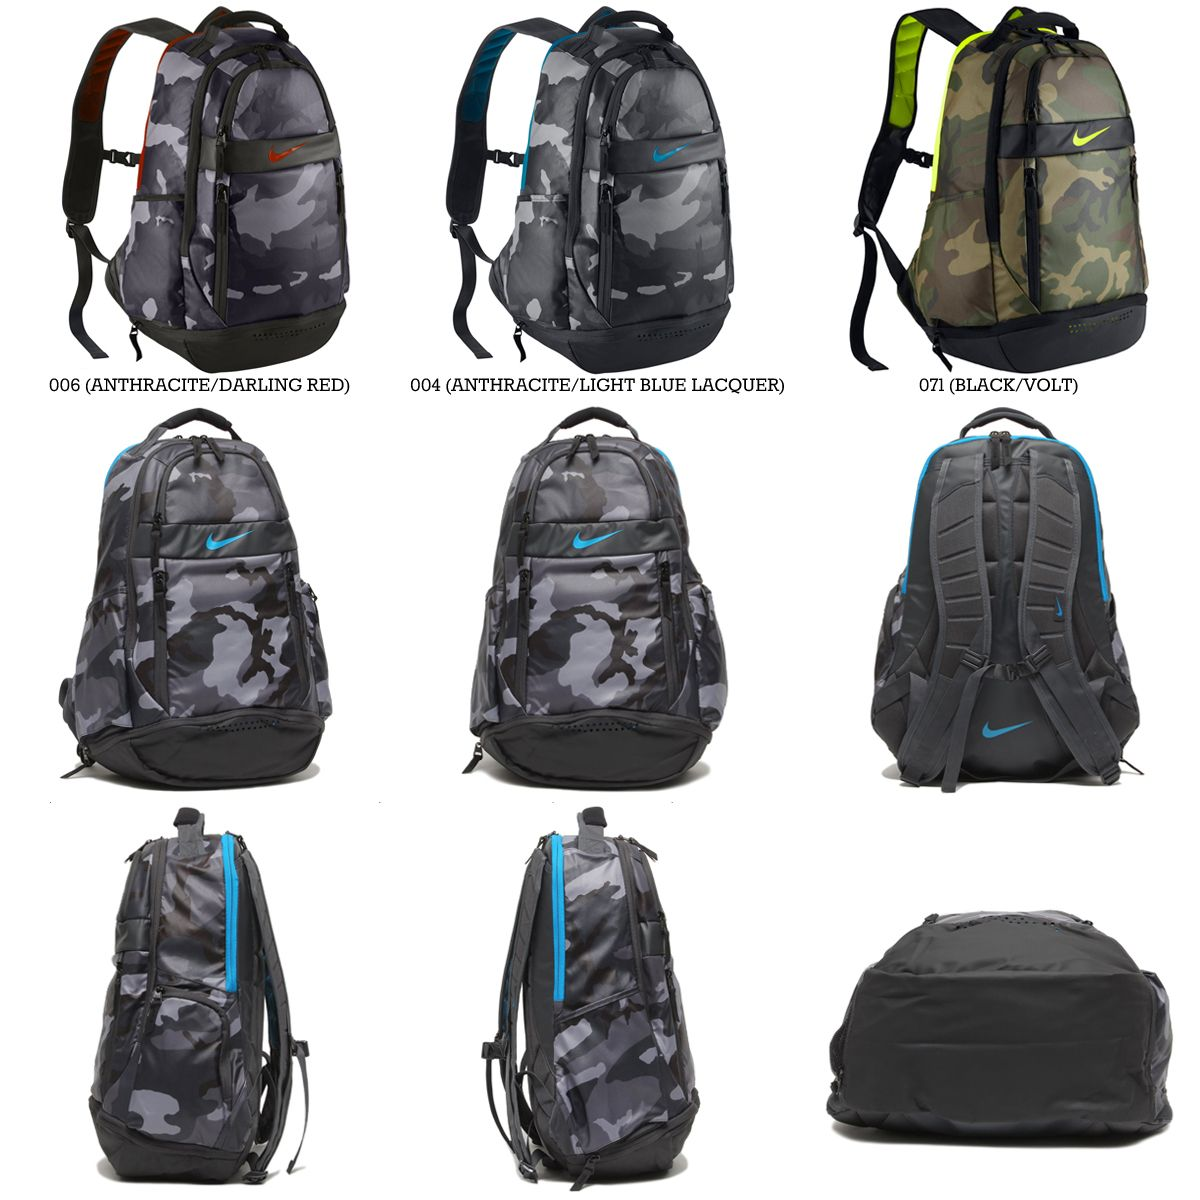 0e75f7ae81 product name | Bags - Backpacks, Global market en Sling backpack